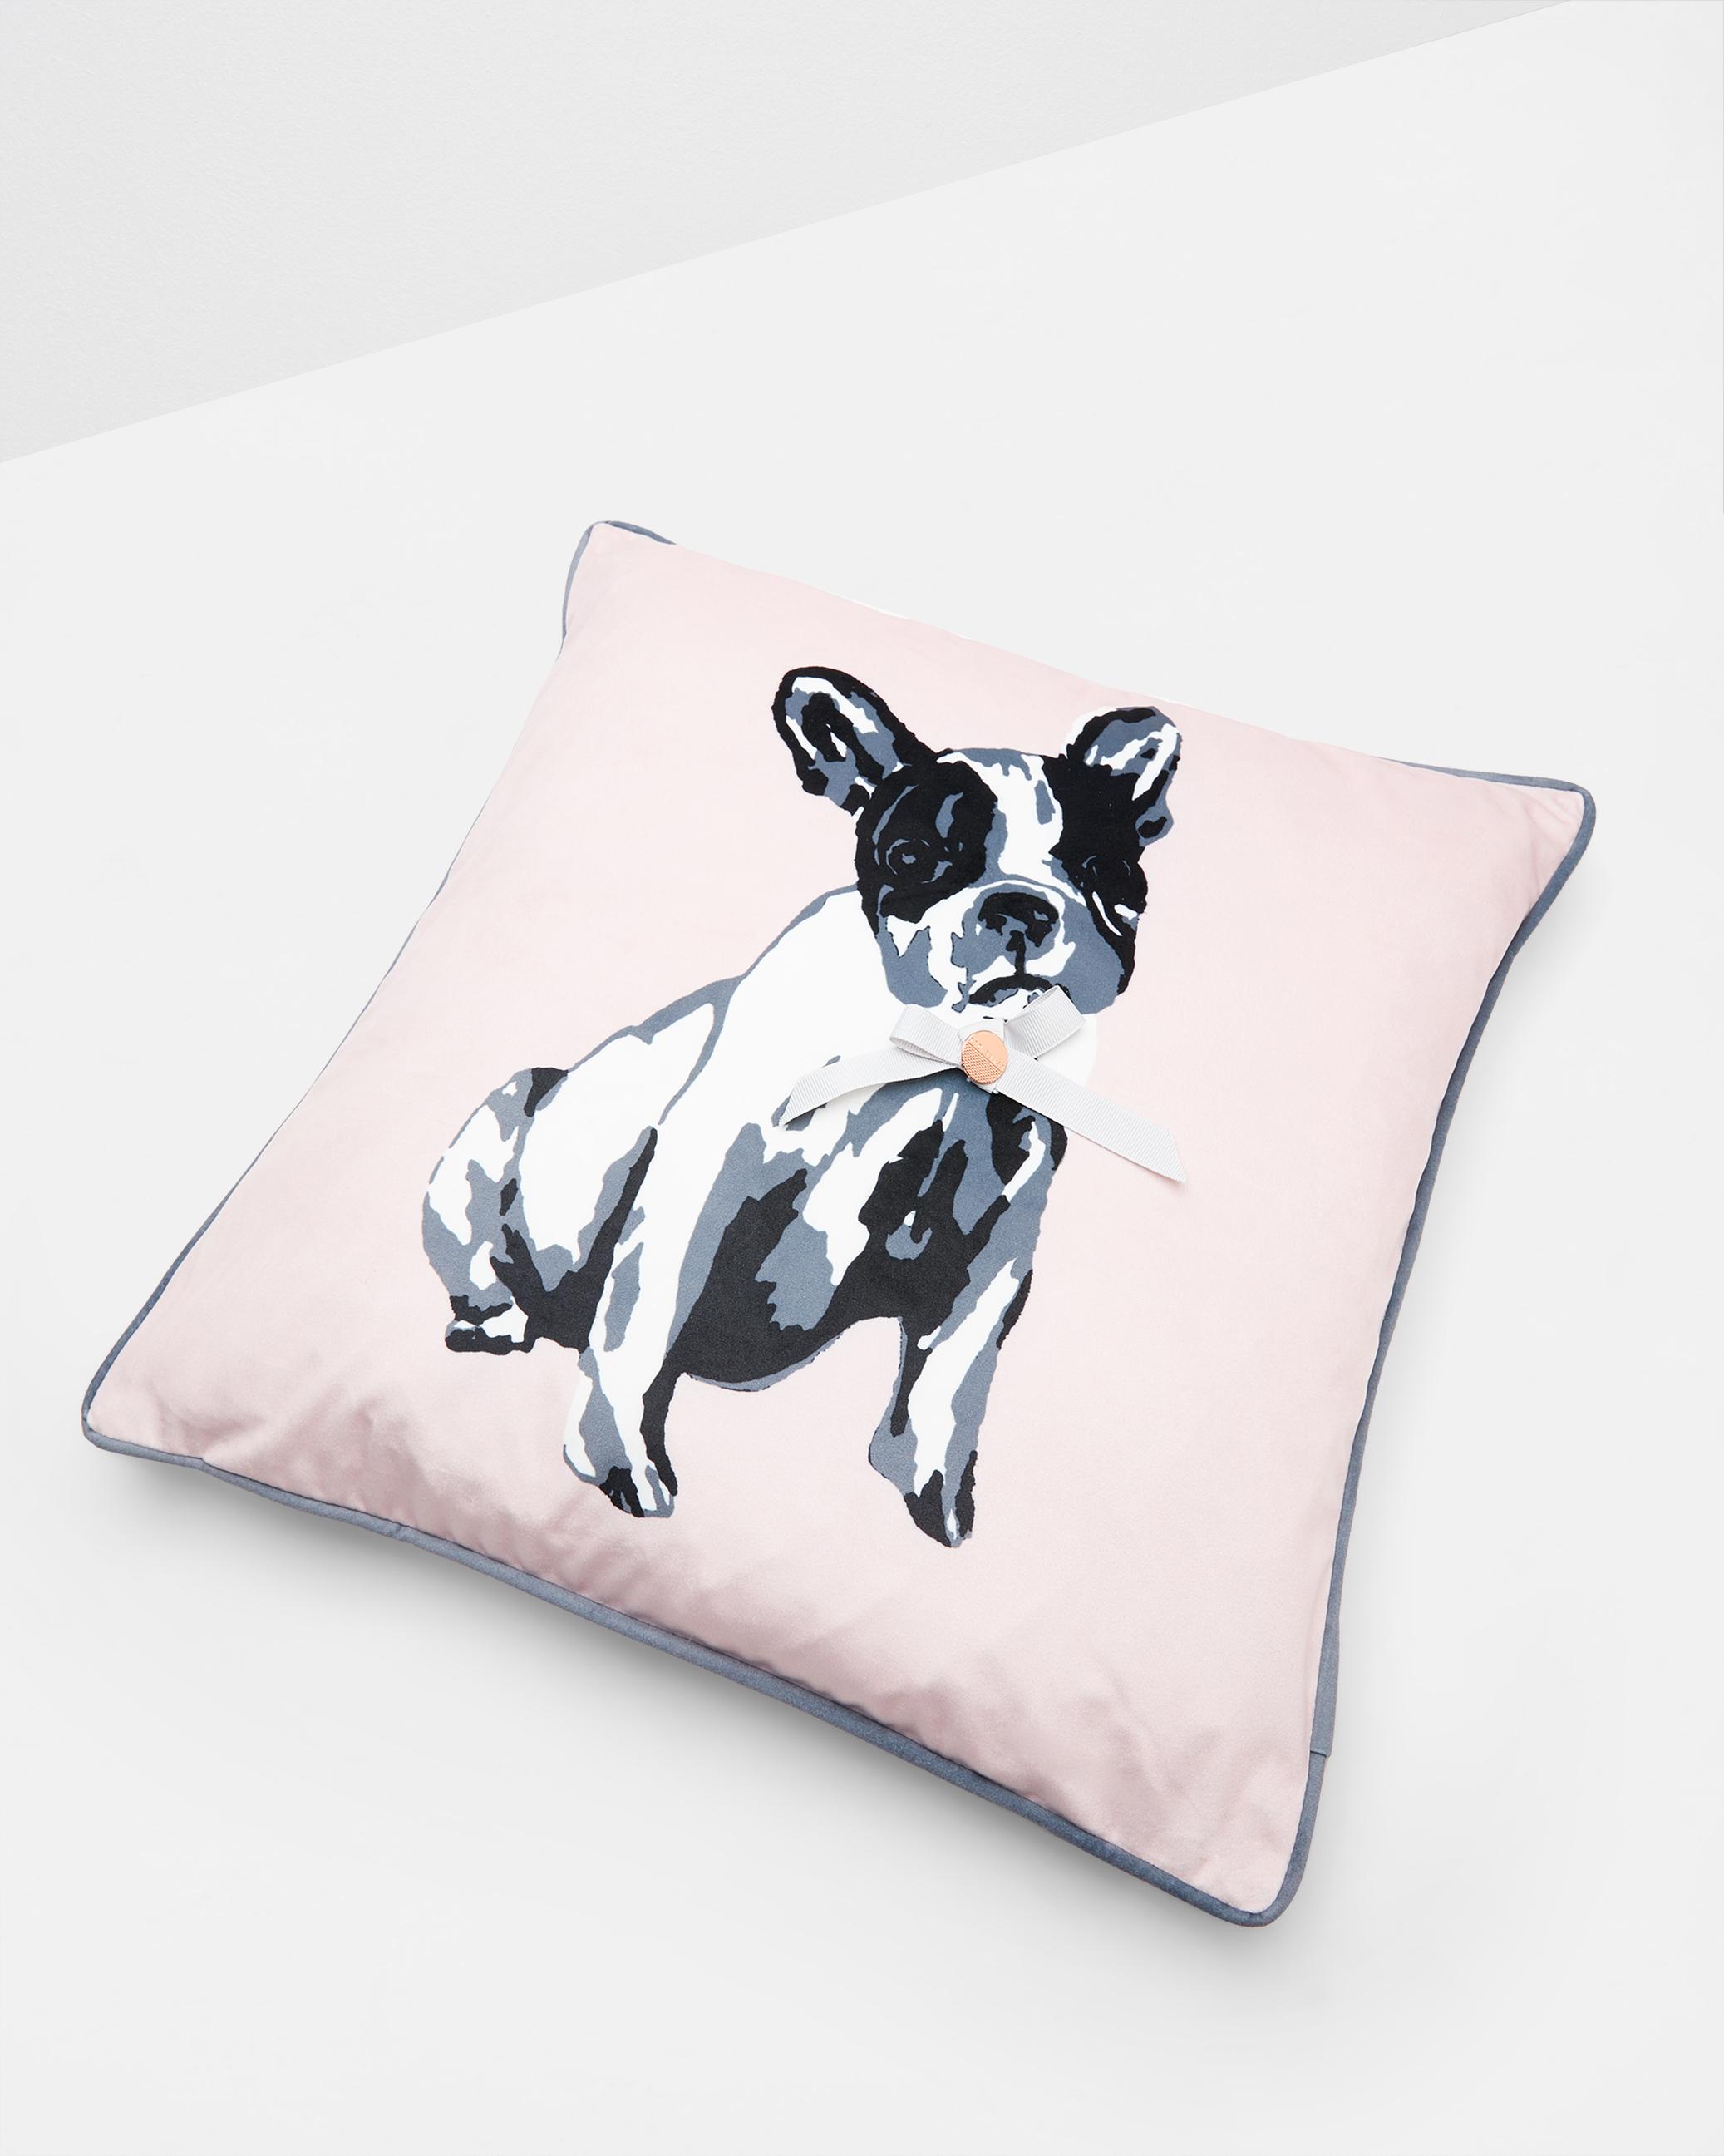 french bulldog cushion pale pink